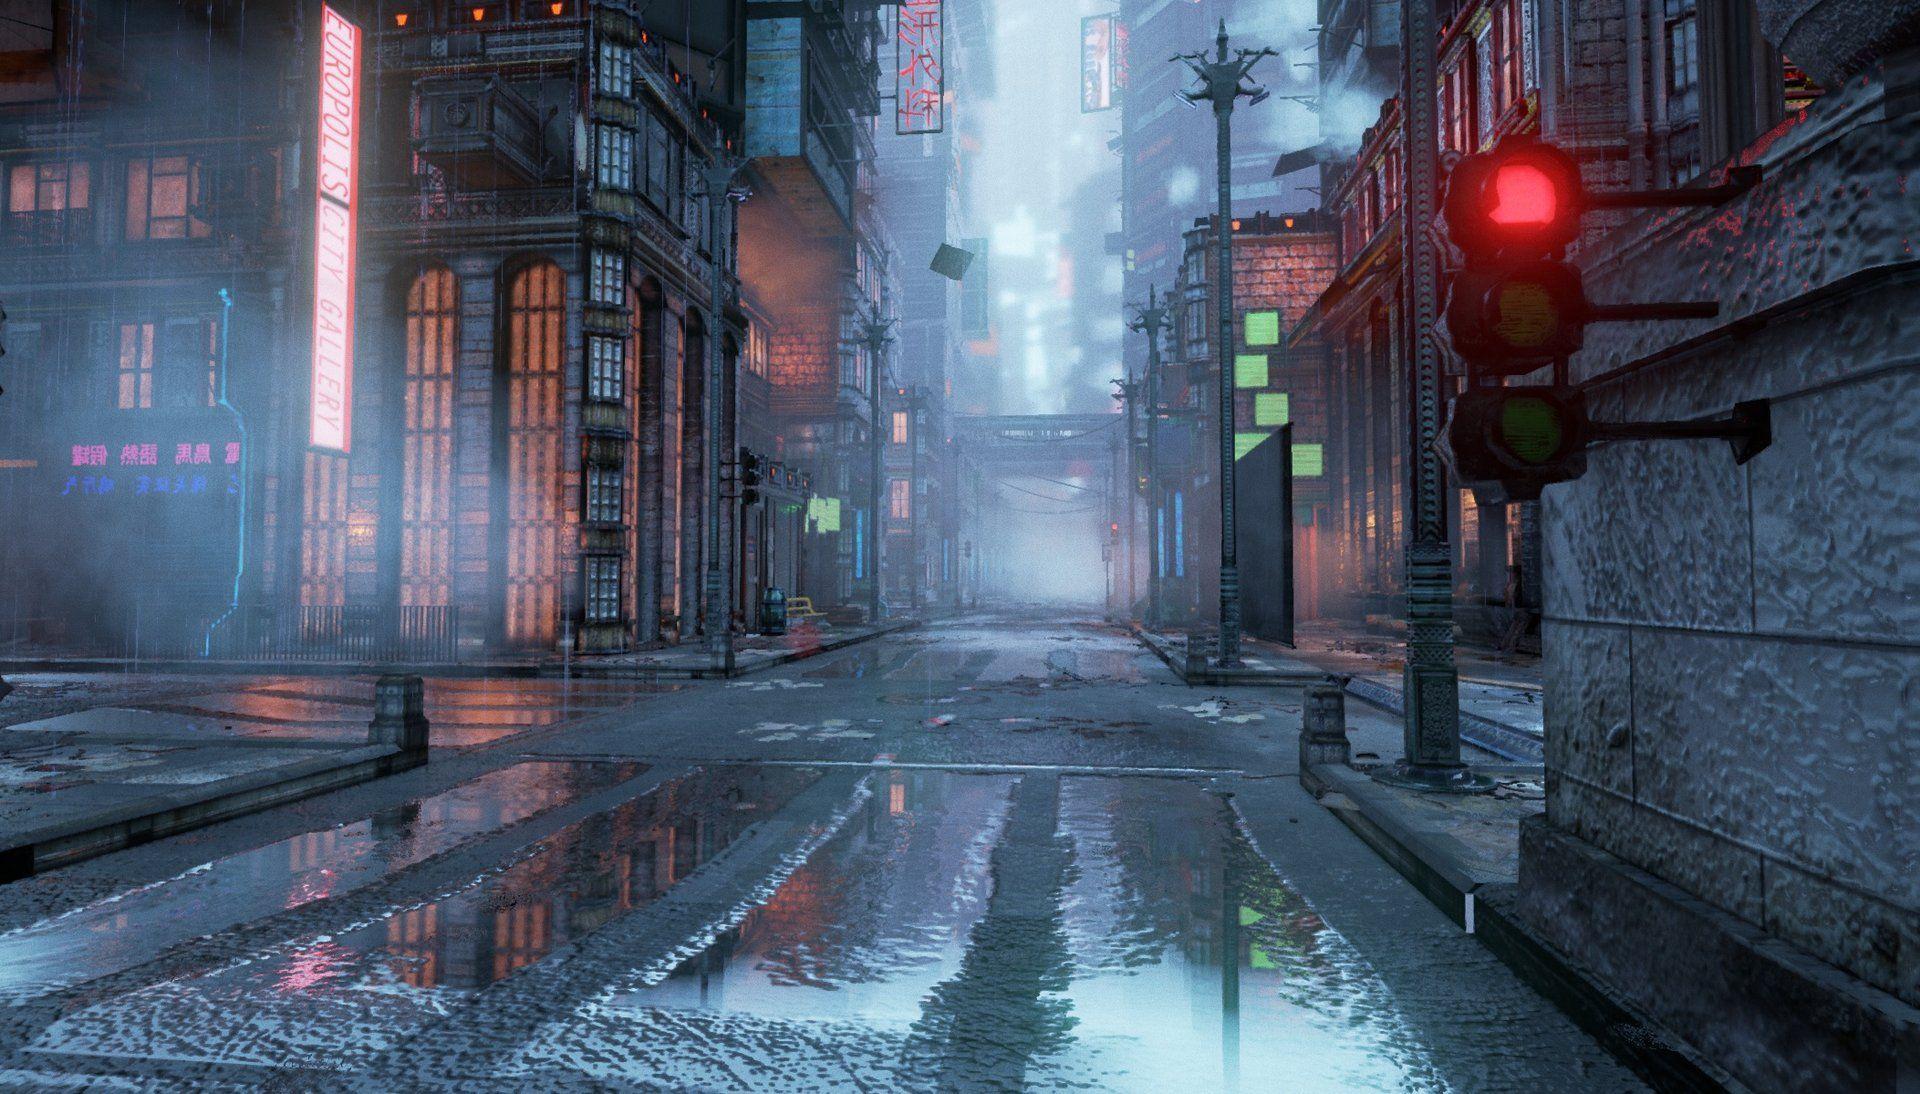 ArtStation - Europolis, Sami Bashir | Cyberpunk/Dystopian